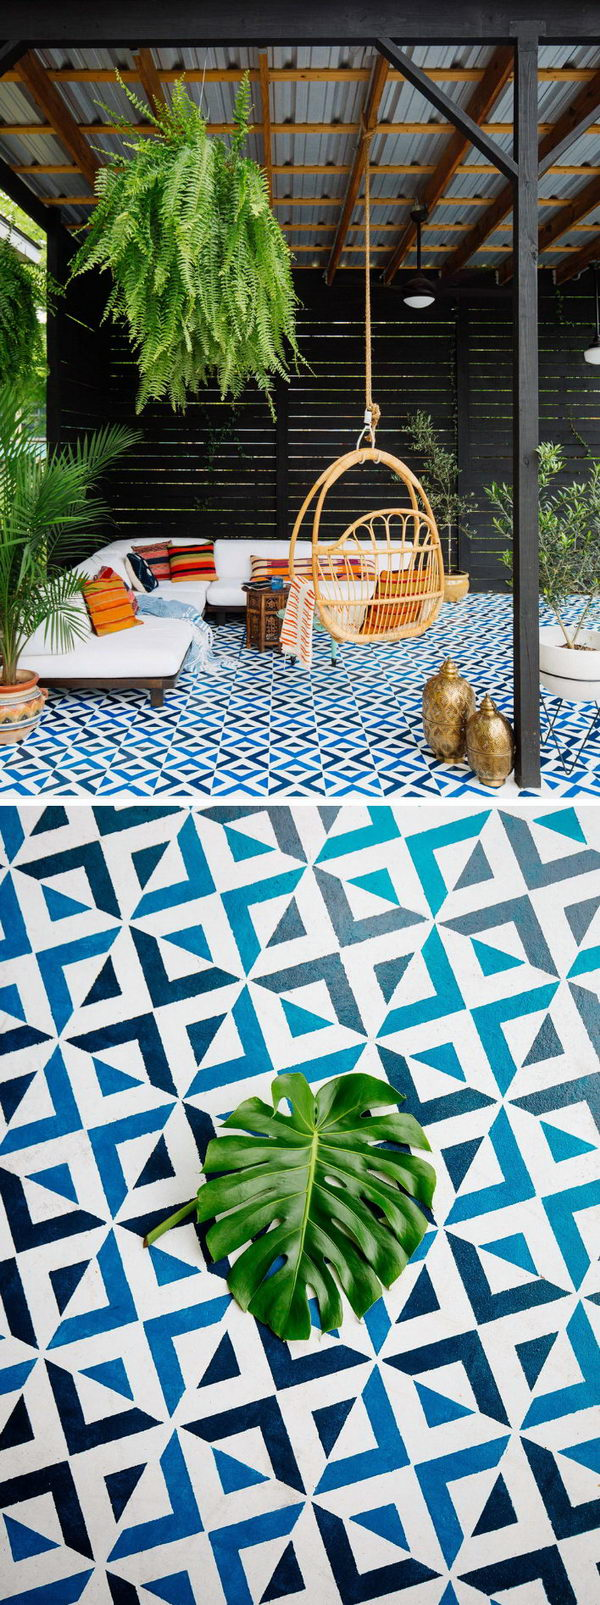 25 Cool Patio Floor Ideas for Outdoor 2017 on Cool Backyard Patio Ideas id=68228